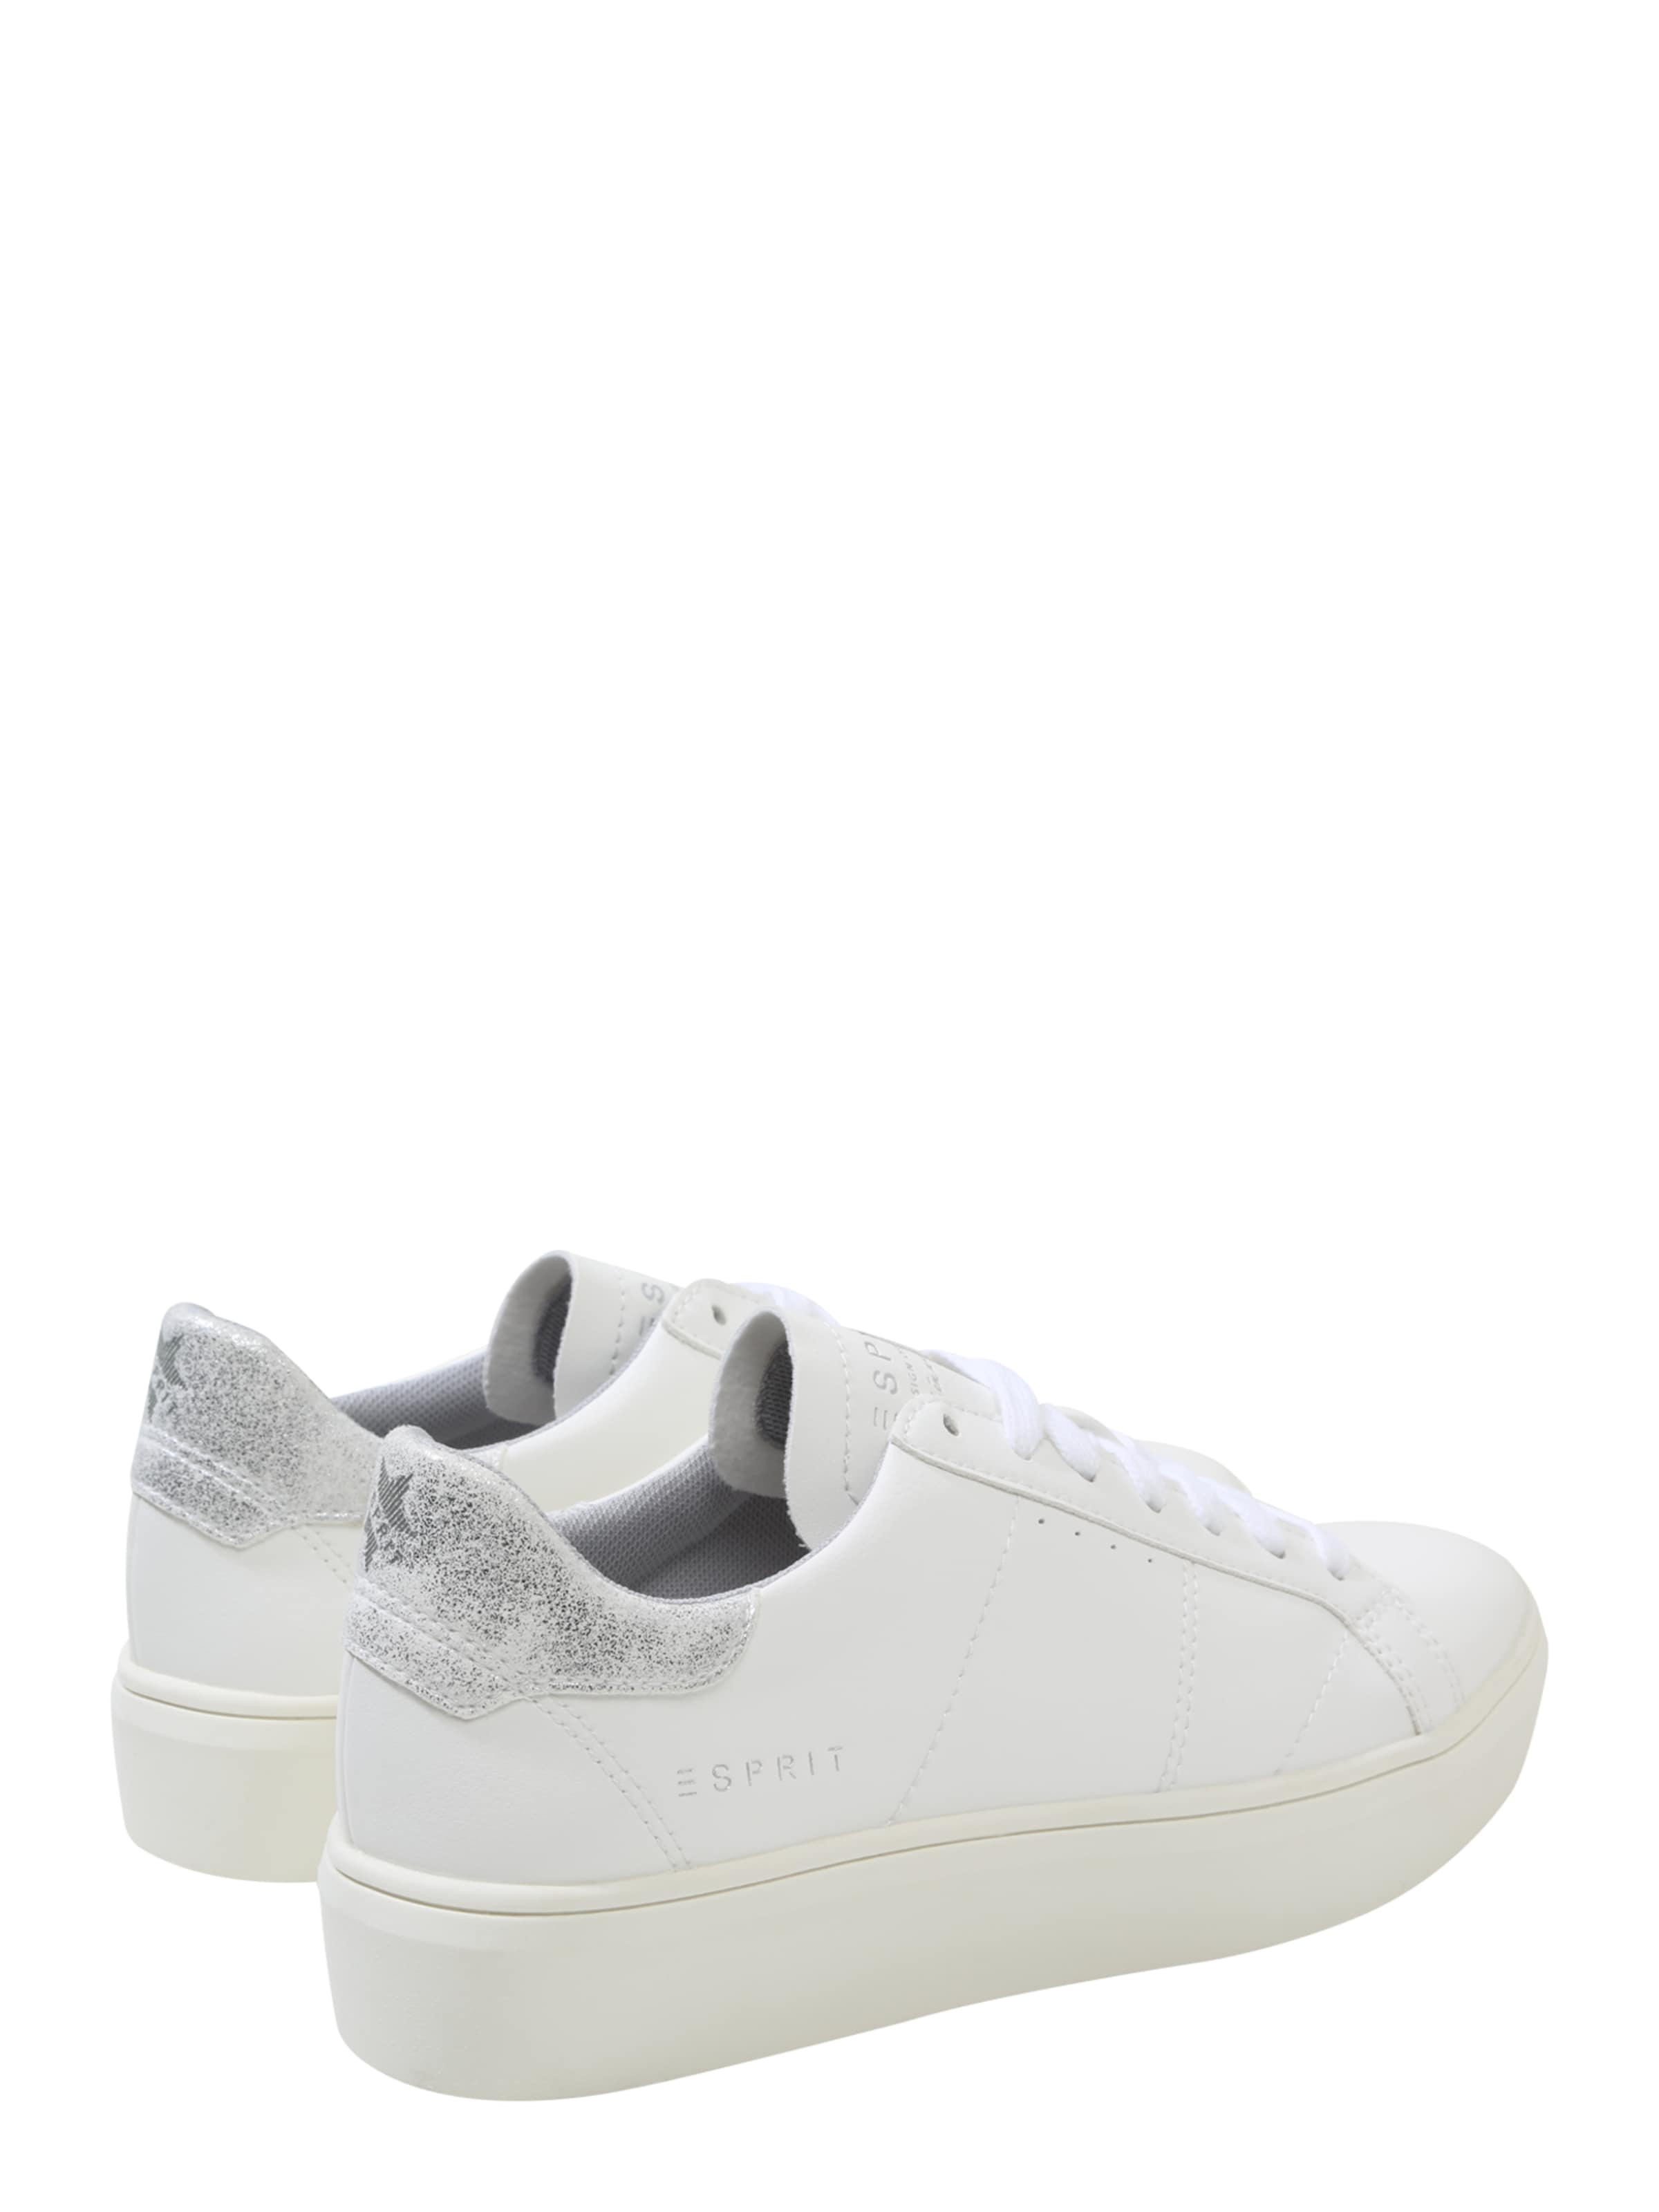 Lace 'elda Sneaker Up' Silber In Esprit l1cFTKJ